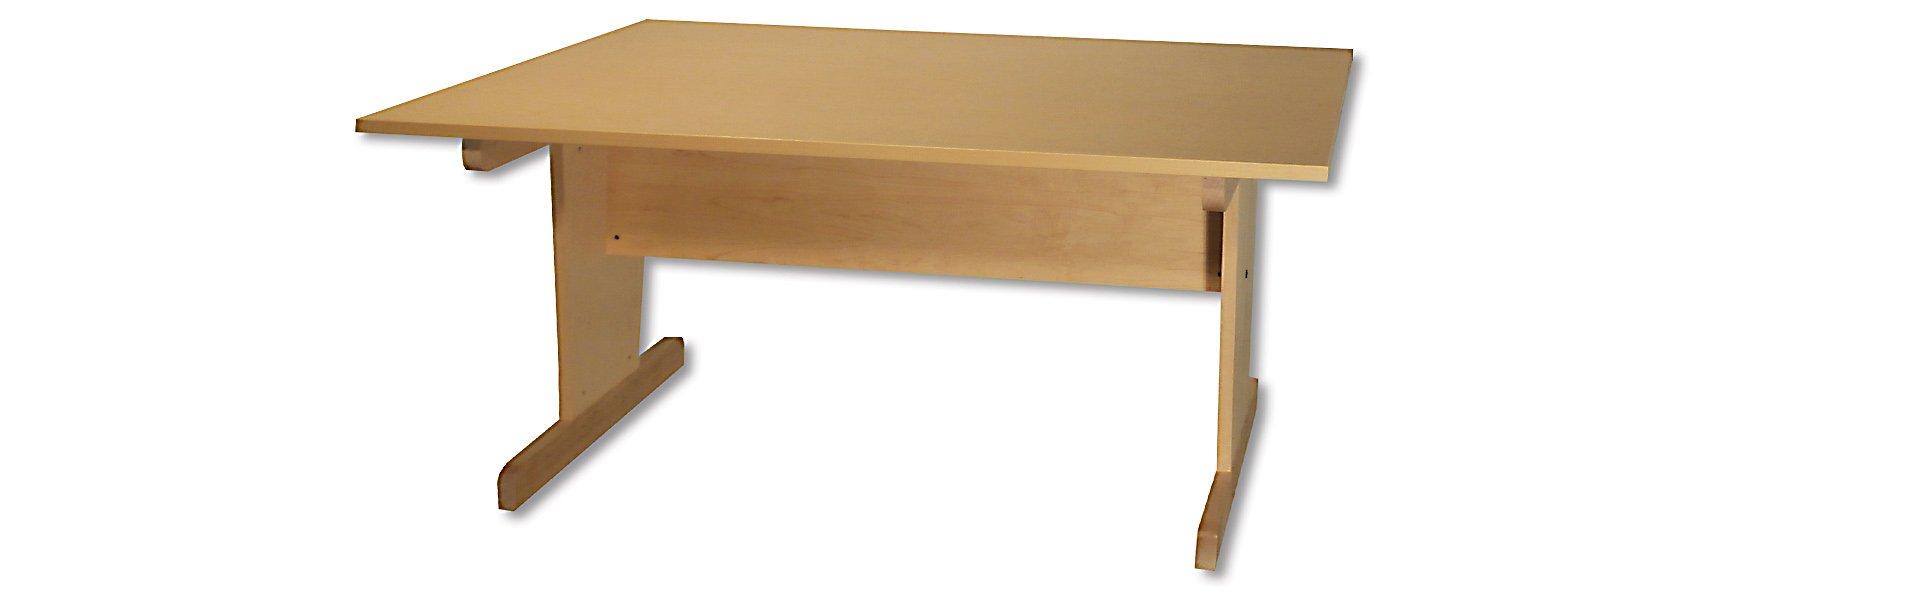 Corilam Maple Art Table